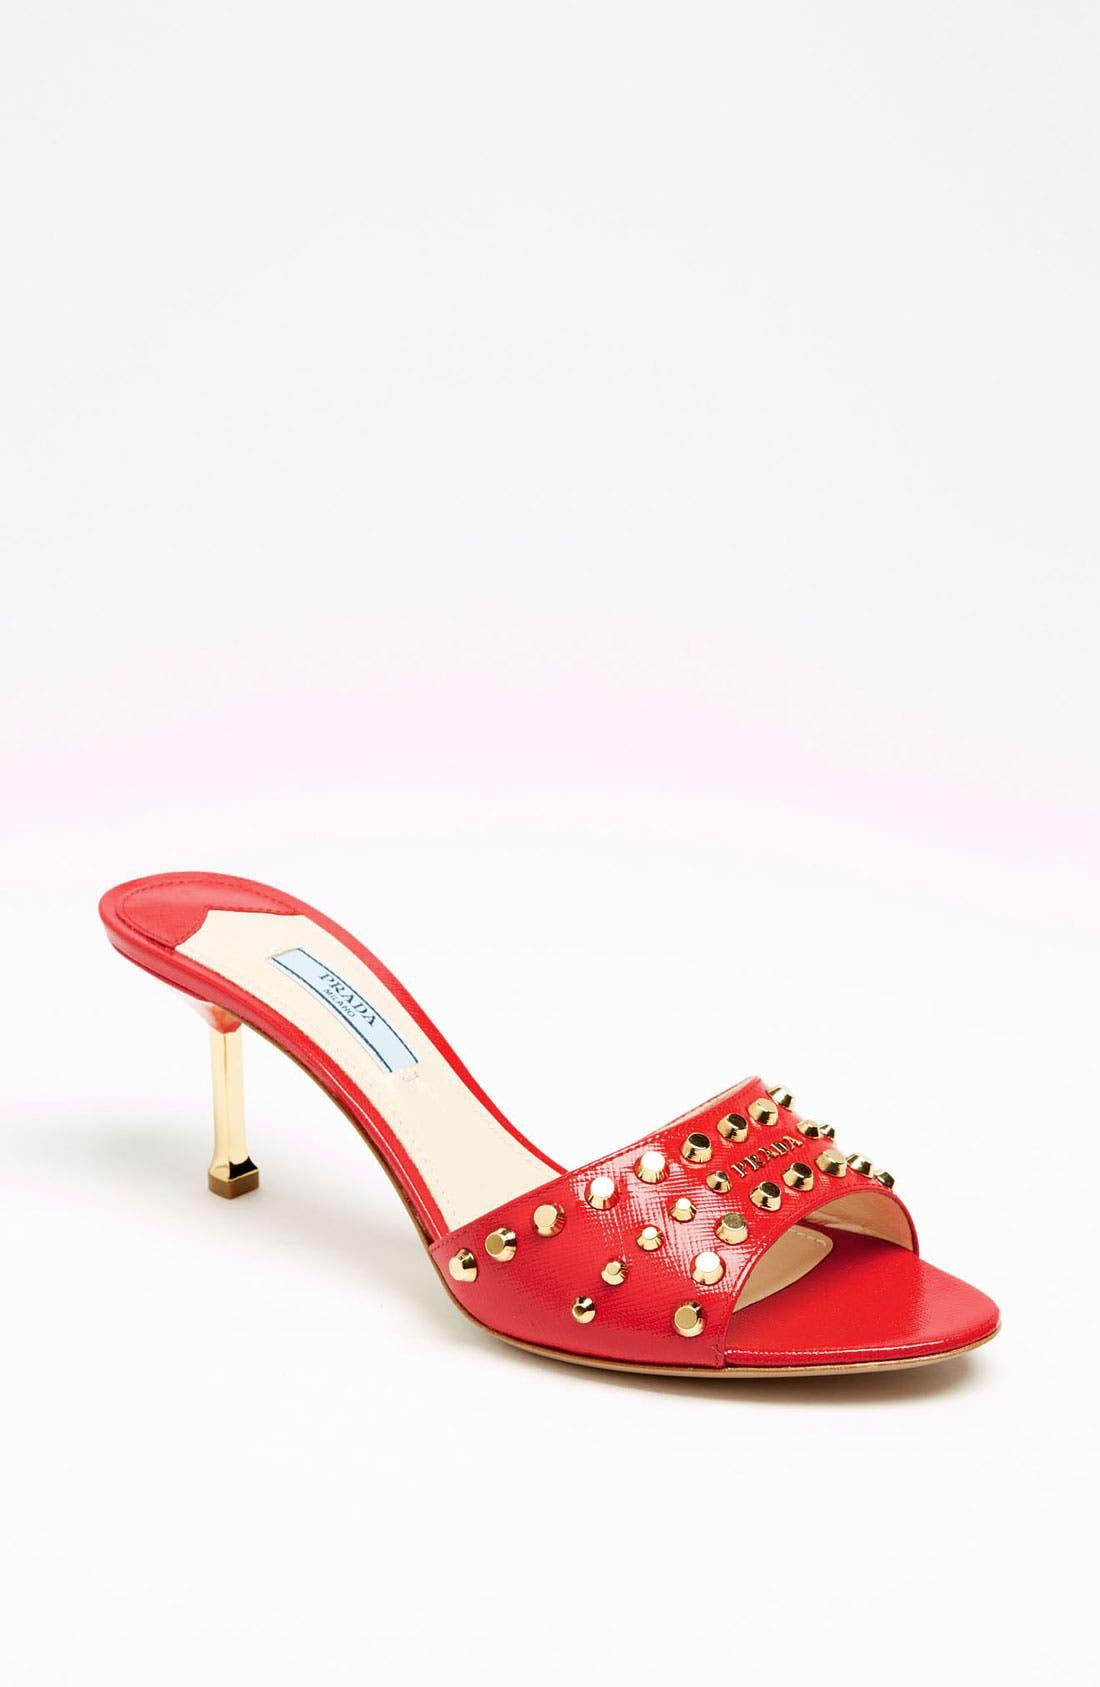 Alternate Image 1 Selected - Prada Studded Slide Sandal